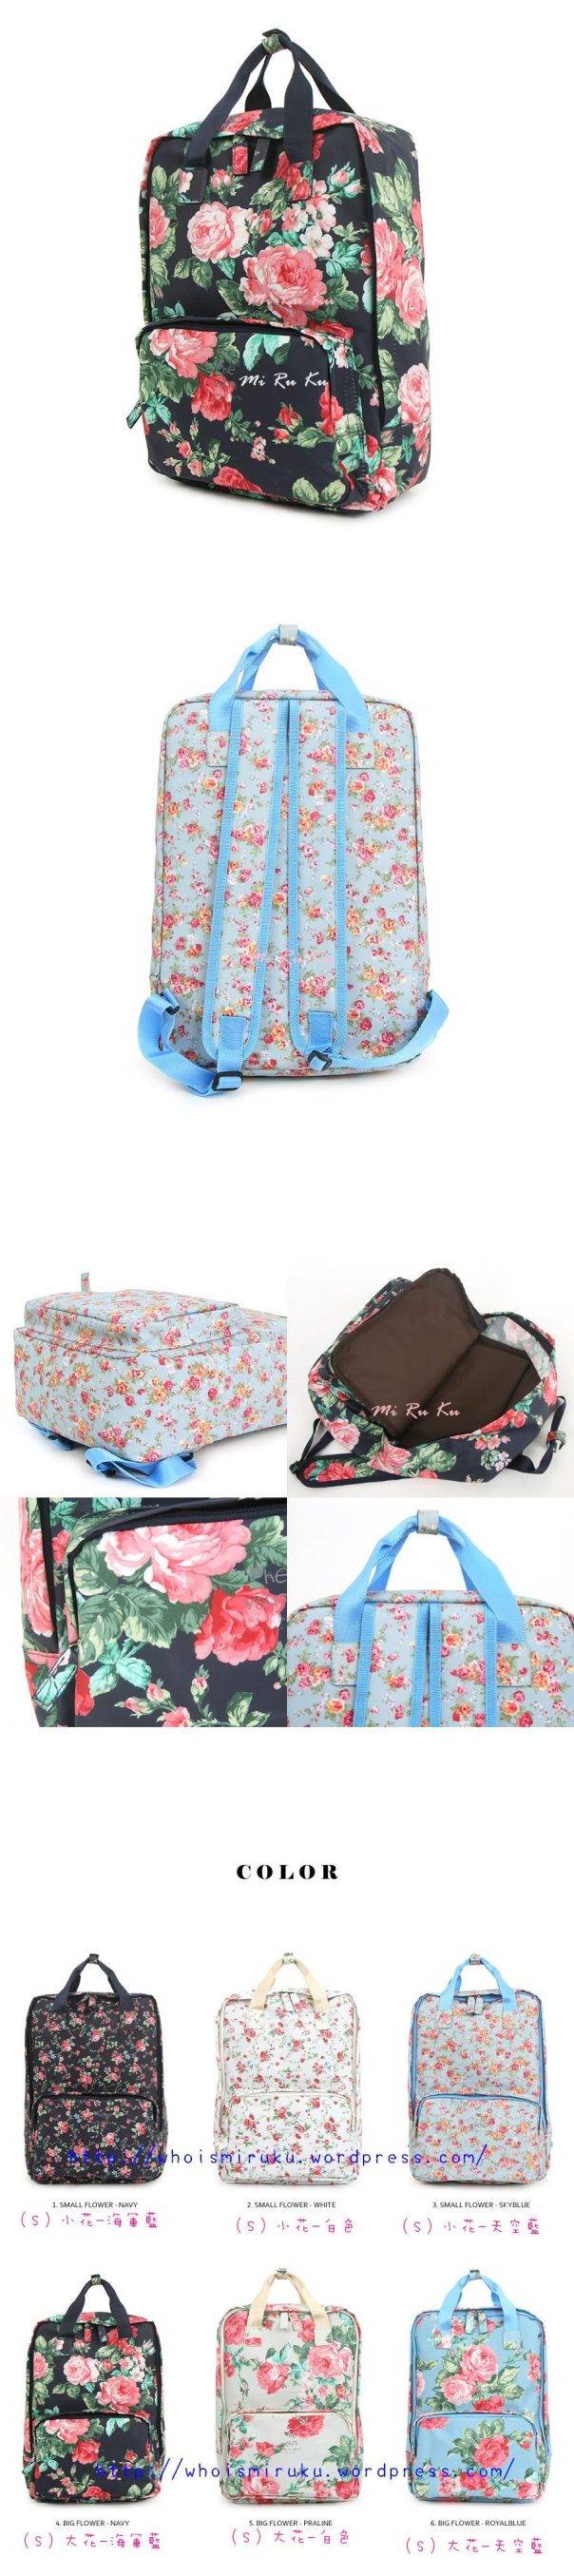 Flowerbackpack-square-detail